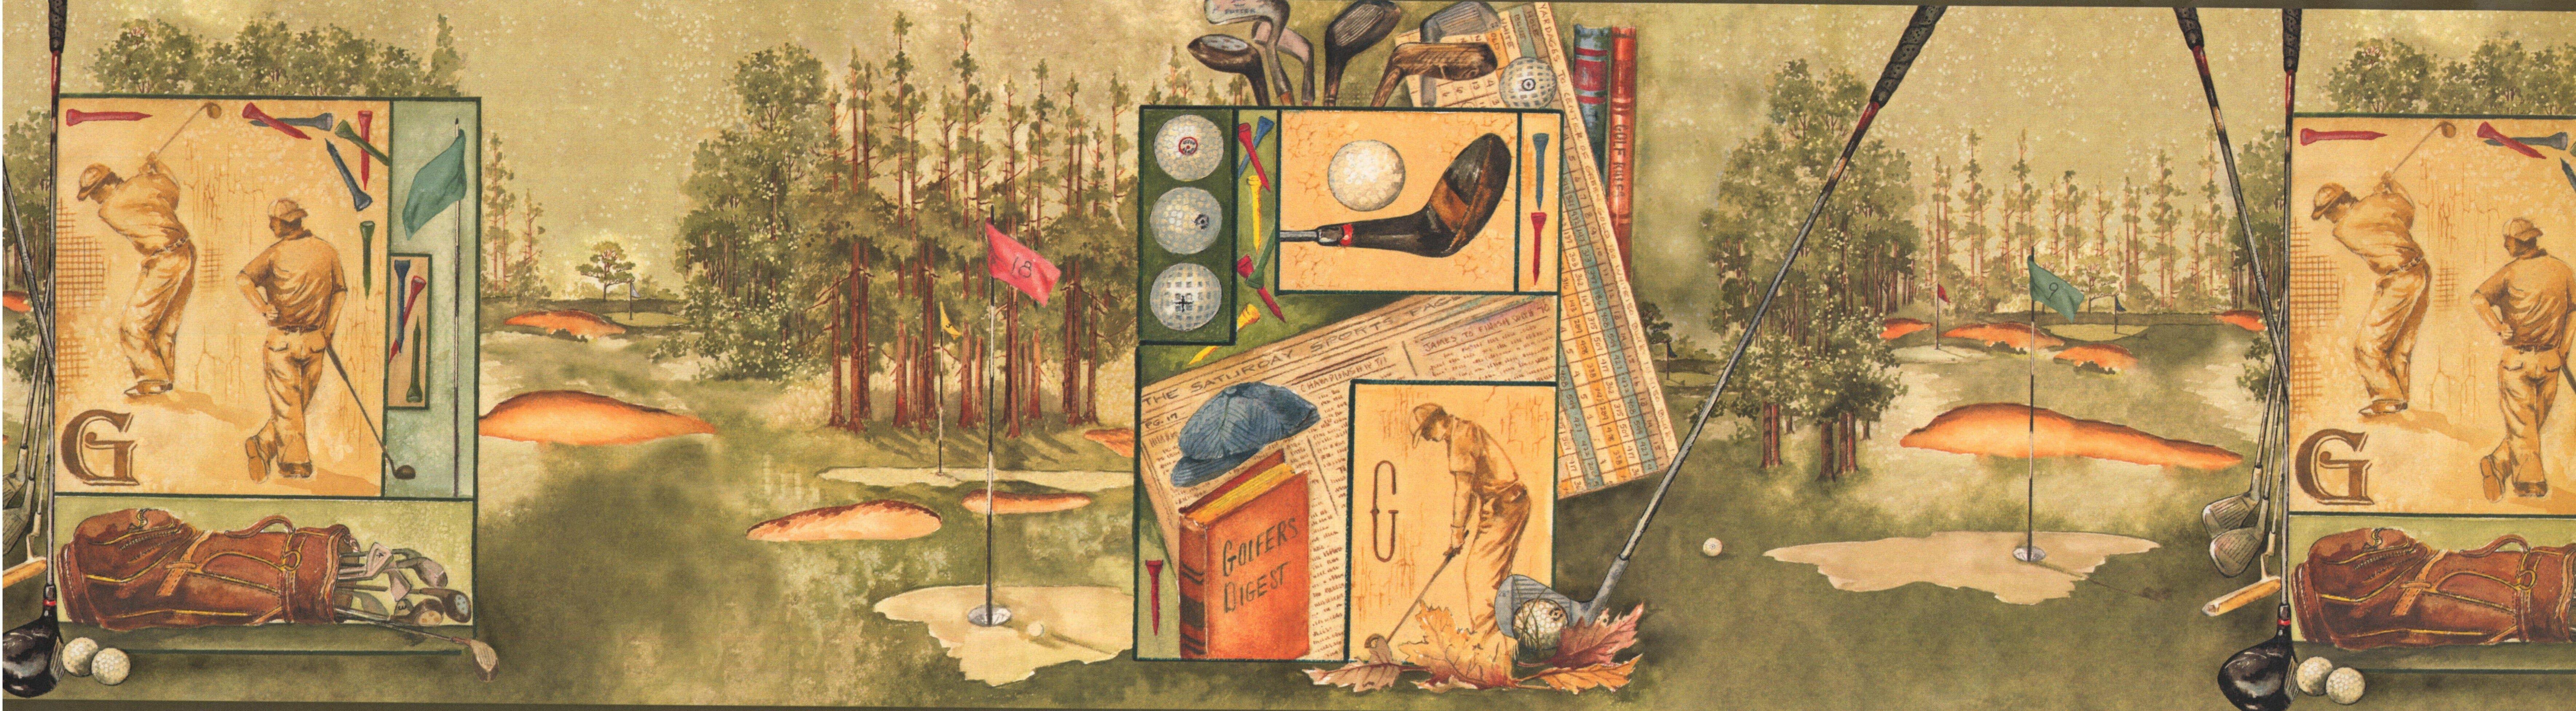 York Wallcoverings Vintage Golf Faux Paint Sports Retro Design 15 L X 7 W Wallpaper Border